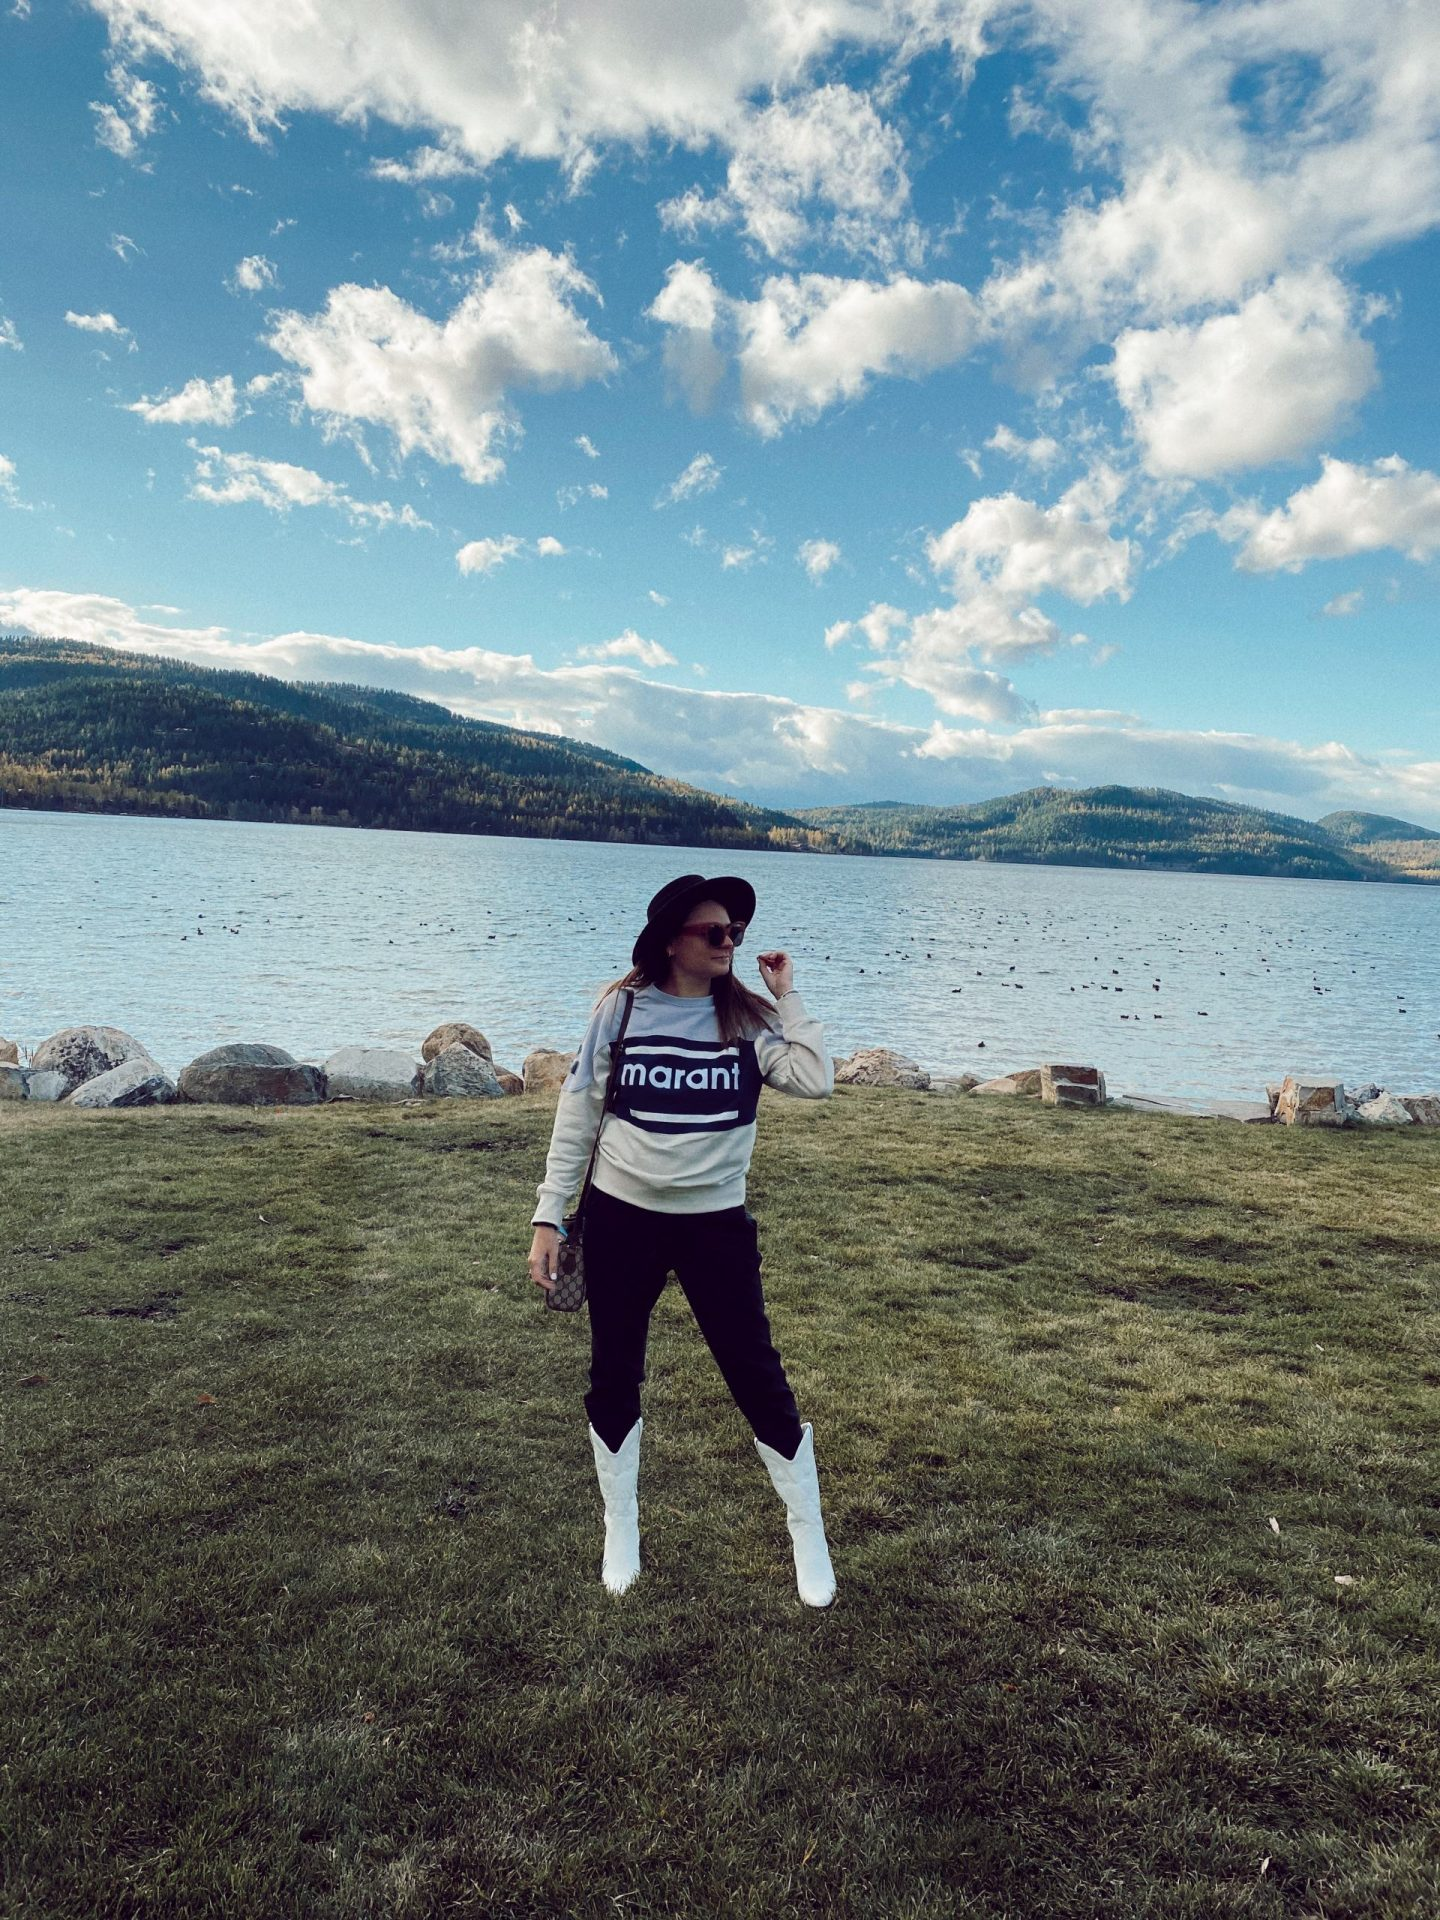 rebecca piersol lodge at whitefish lake